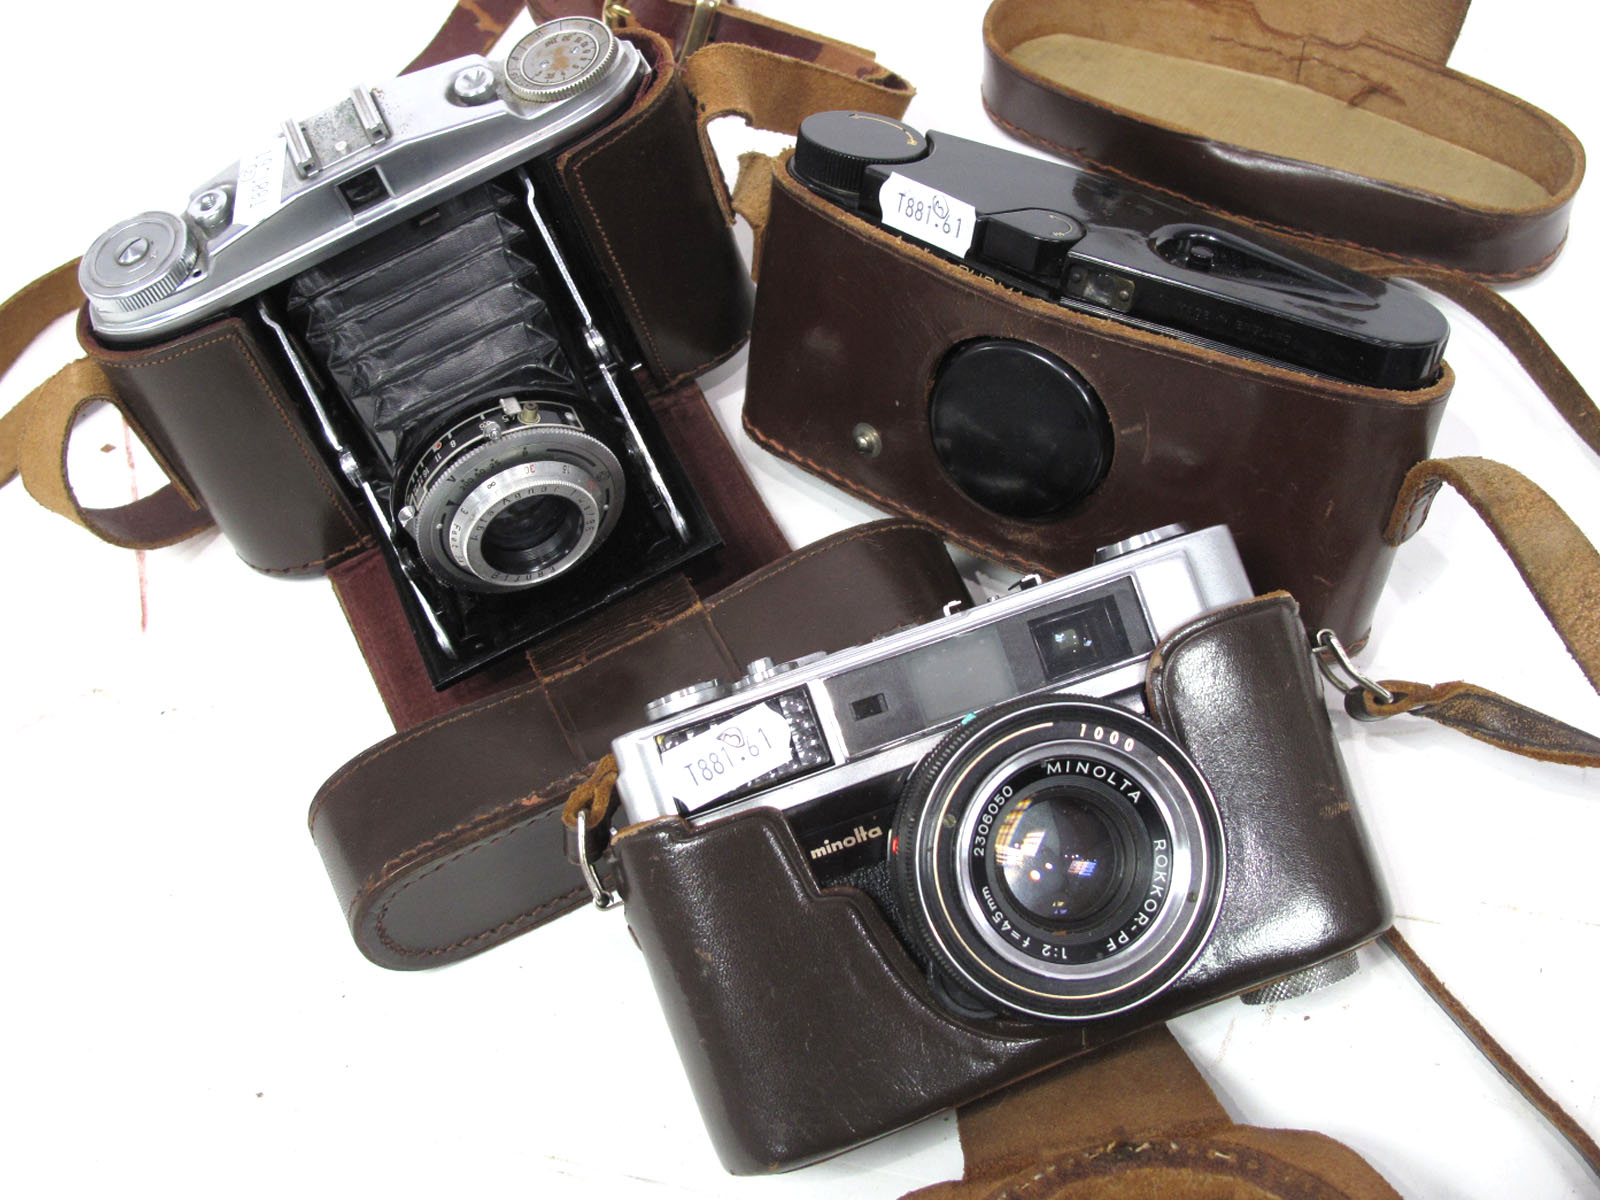 Agfa Isolette, Minolta Al and a Purma Special camera. (3)